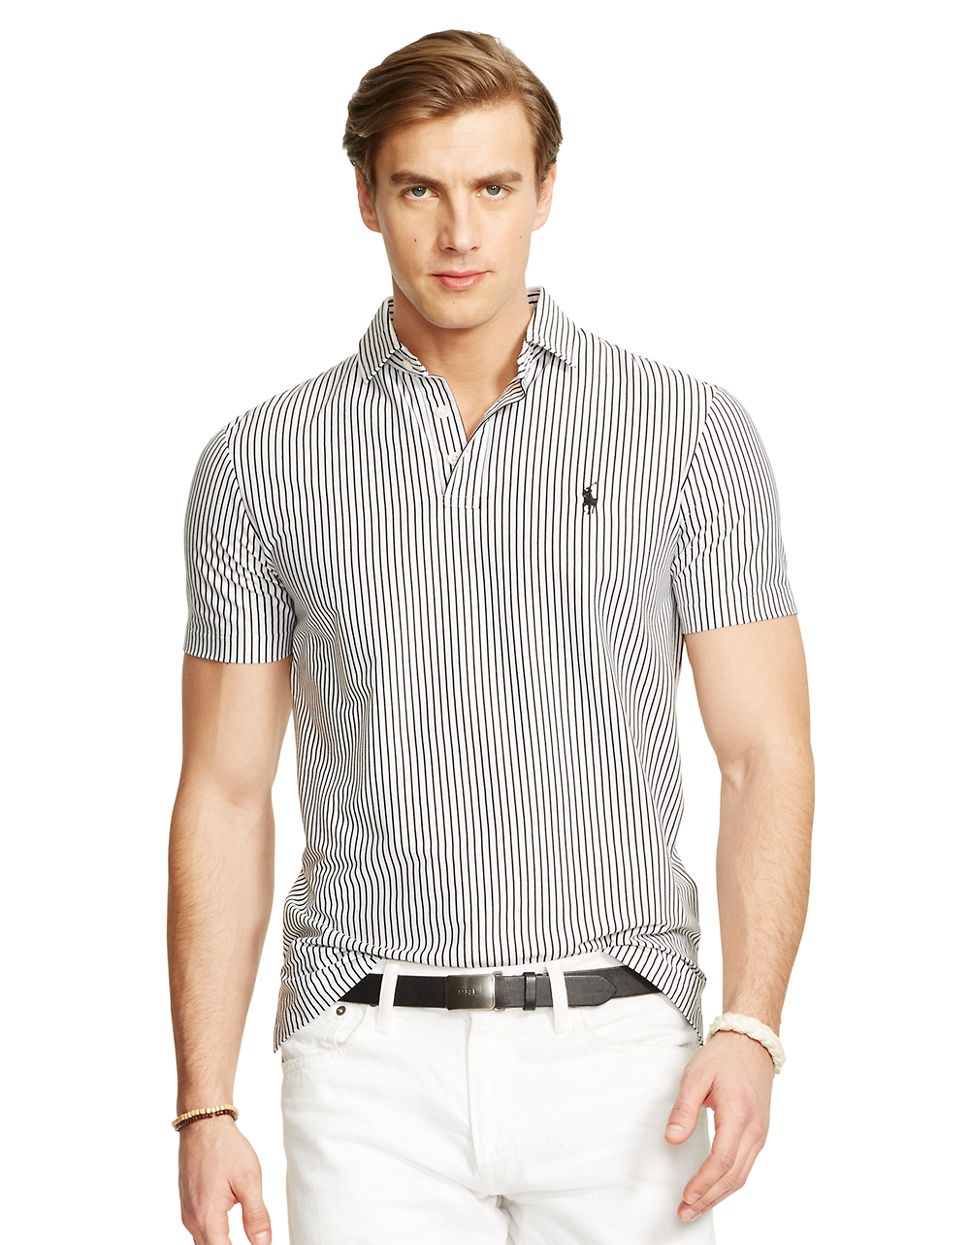 Polo ralph lauren striped cotton interlock shirt in black for Black cotton polo shirt